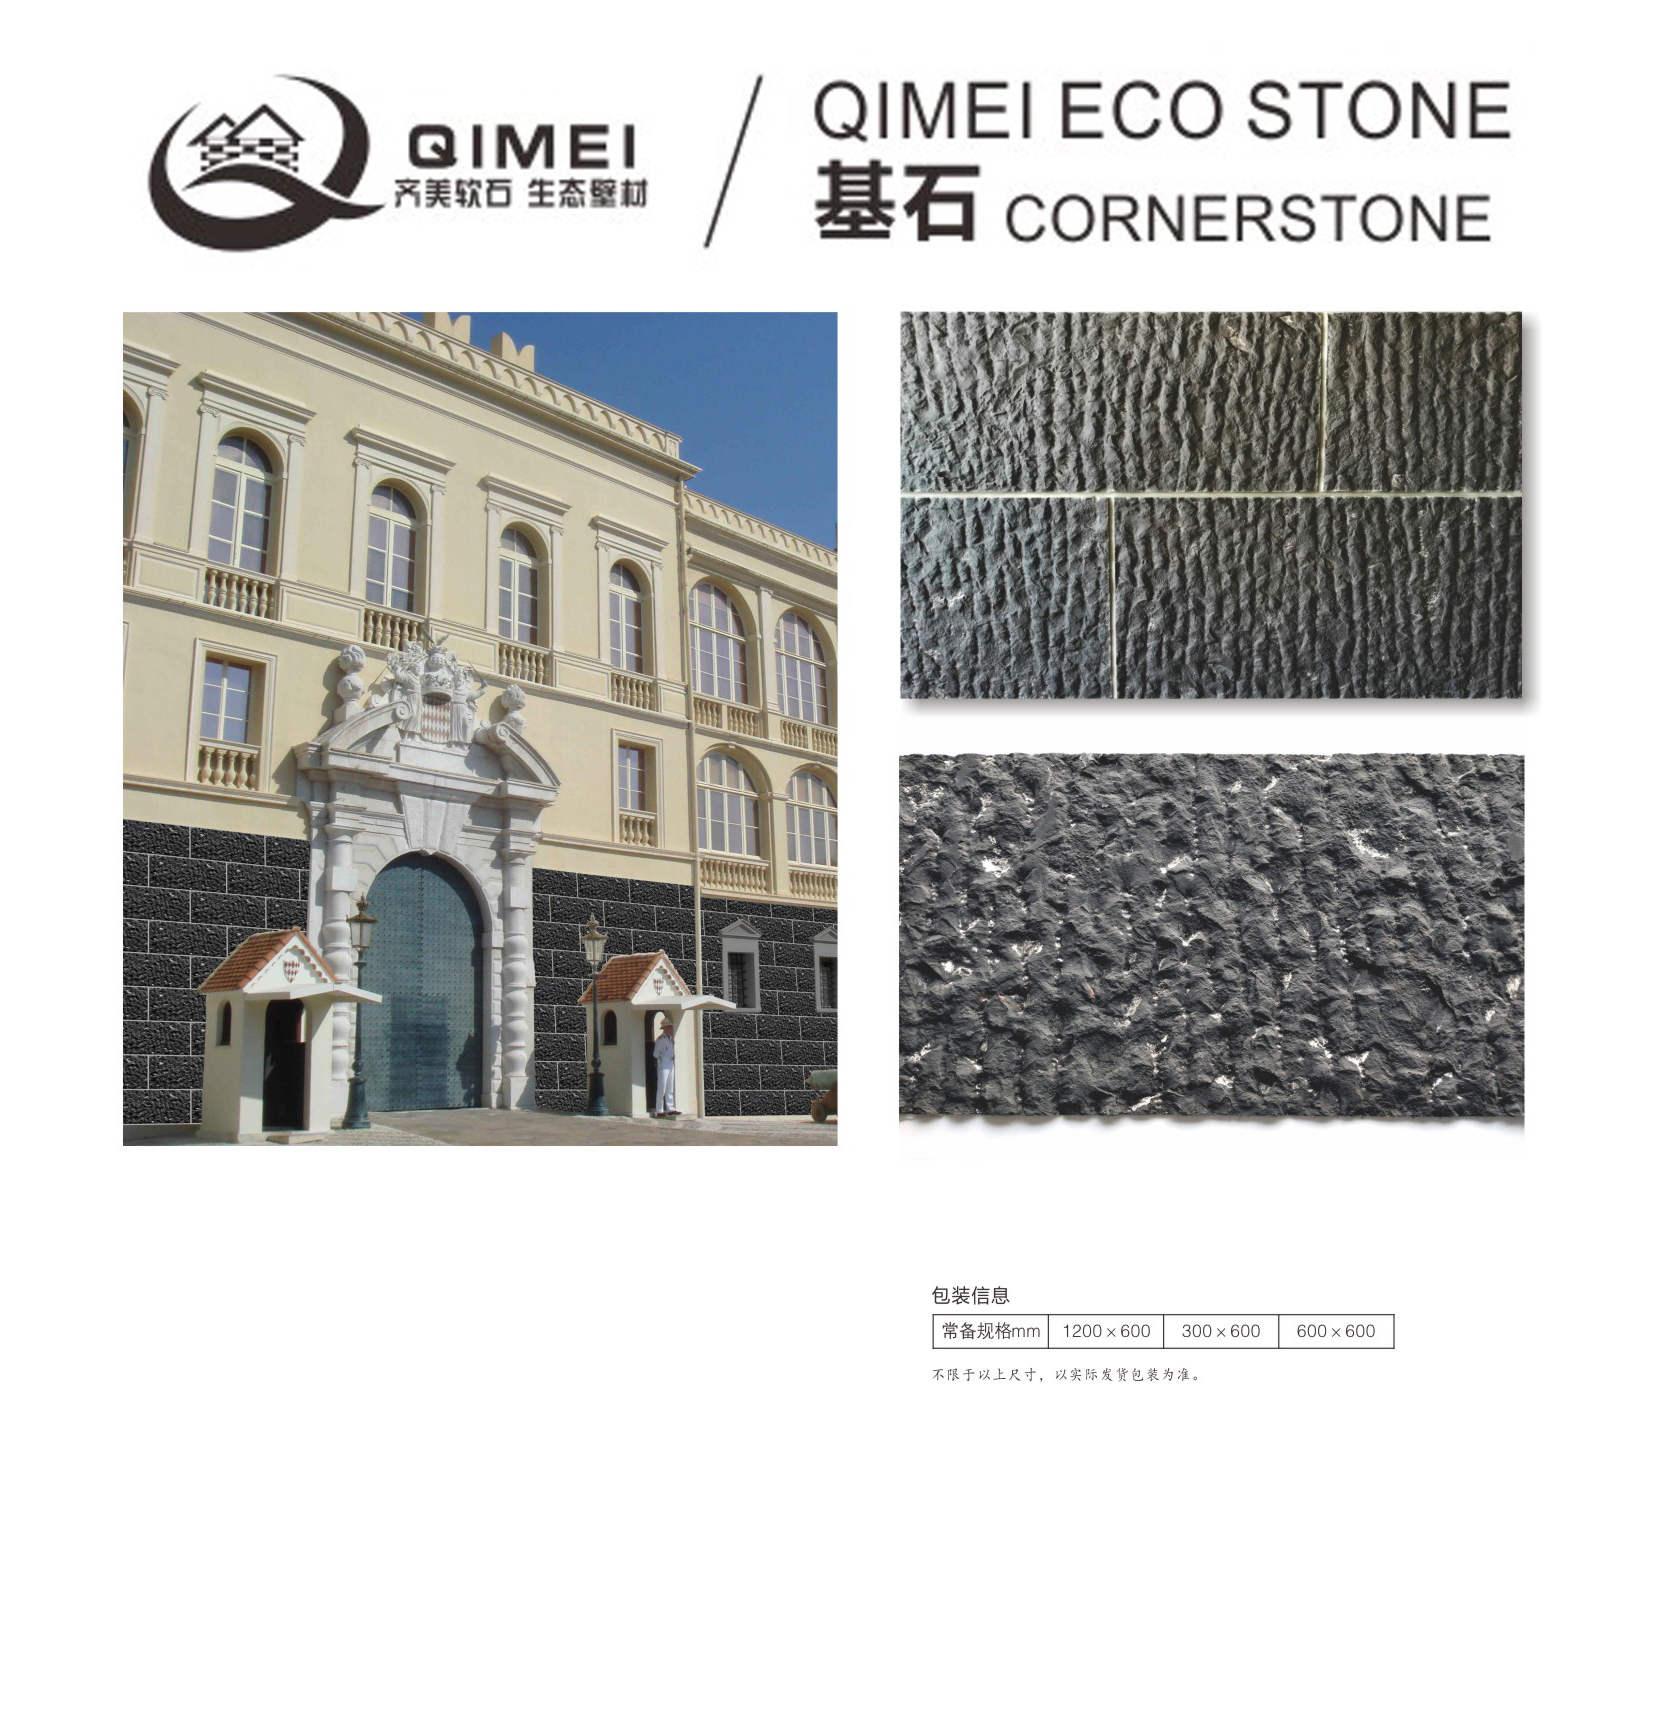 China baidai qimei corner stone flexible and soft stone